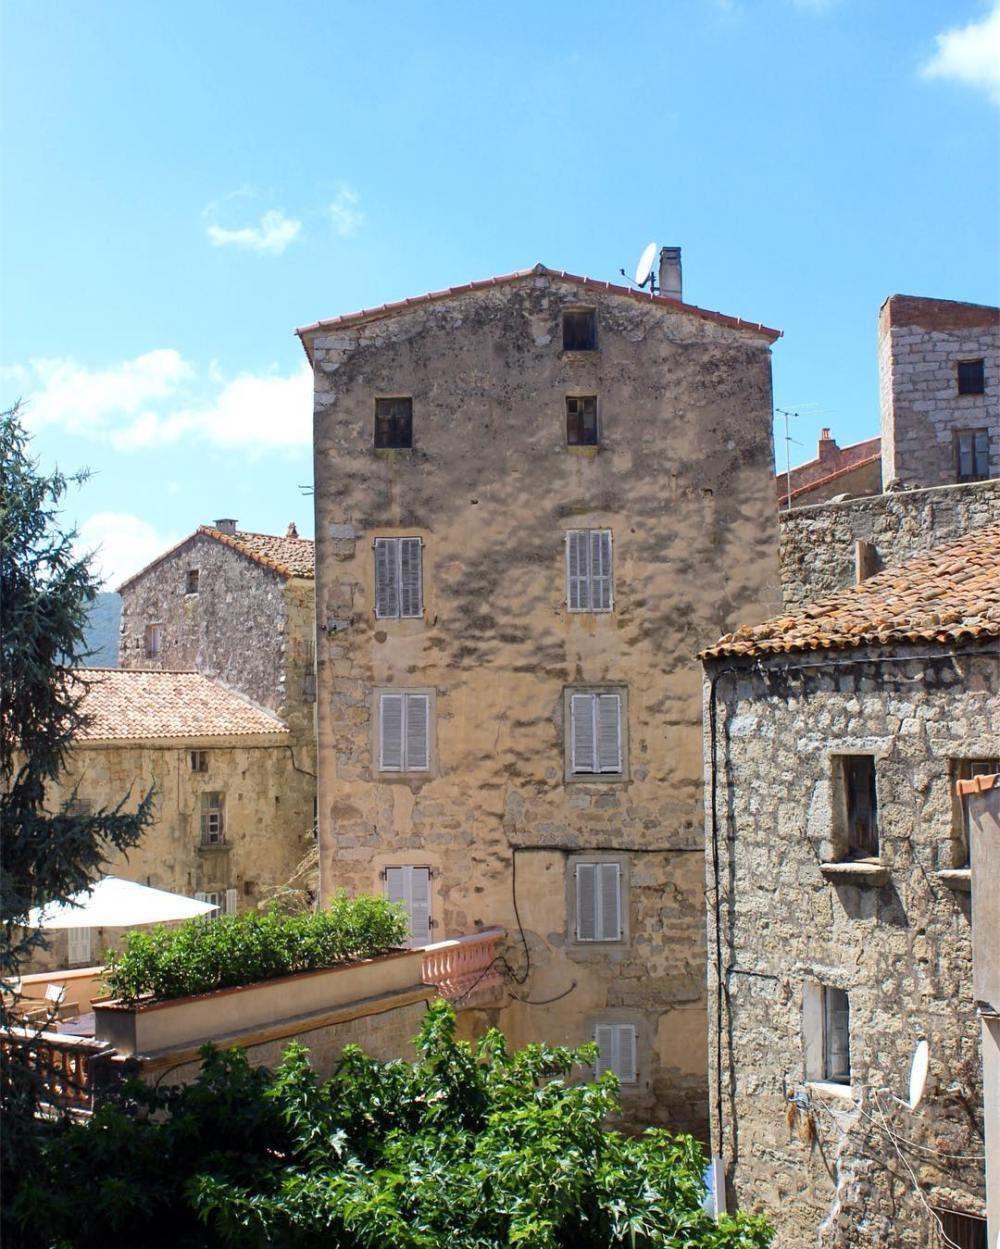 Les jolies btisses des villages Corses